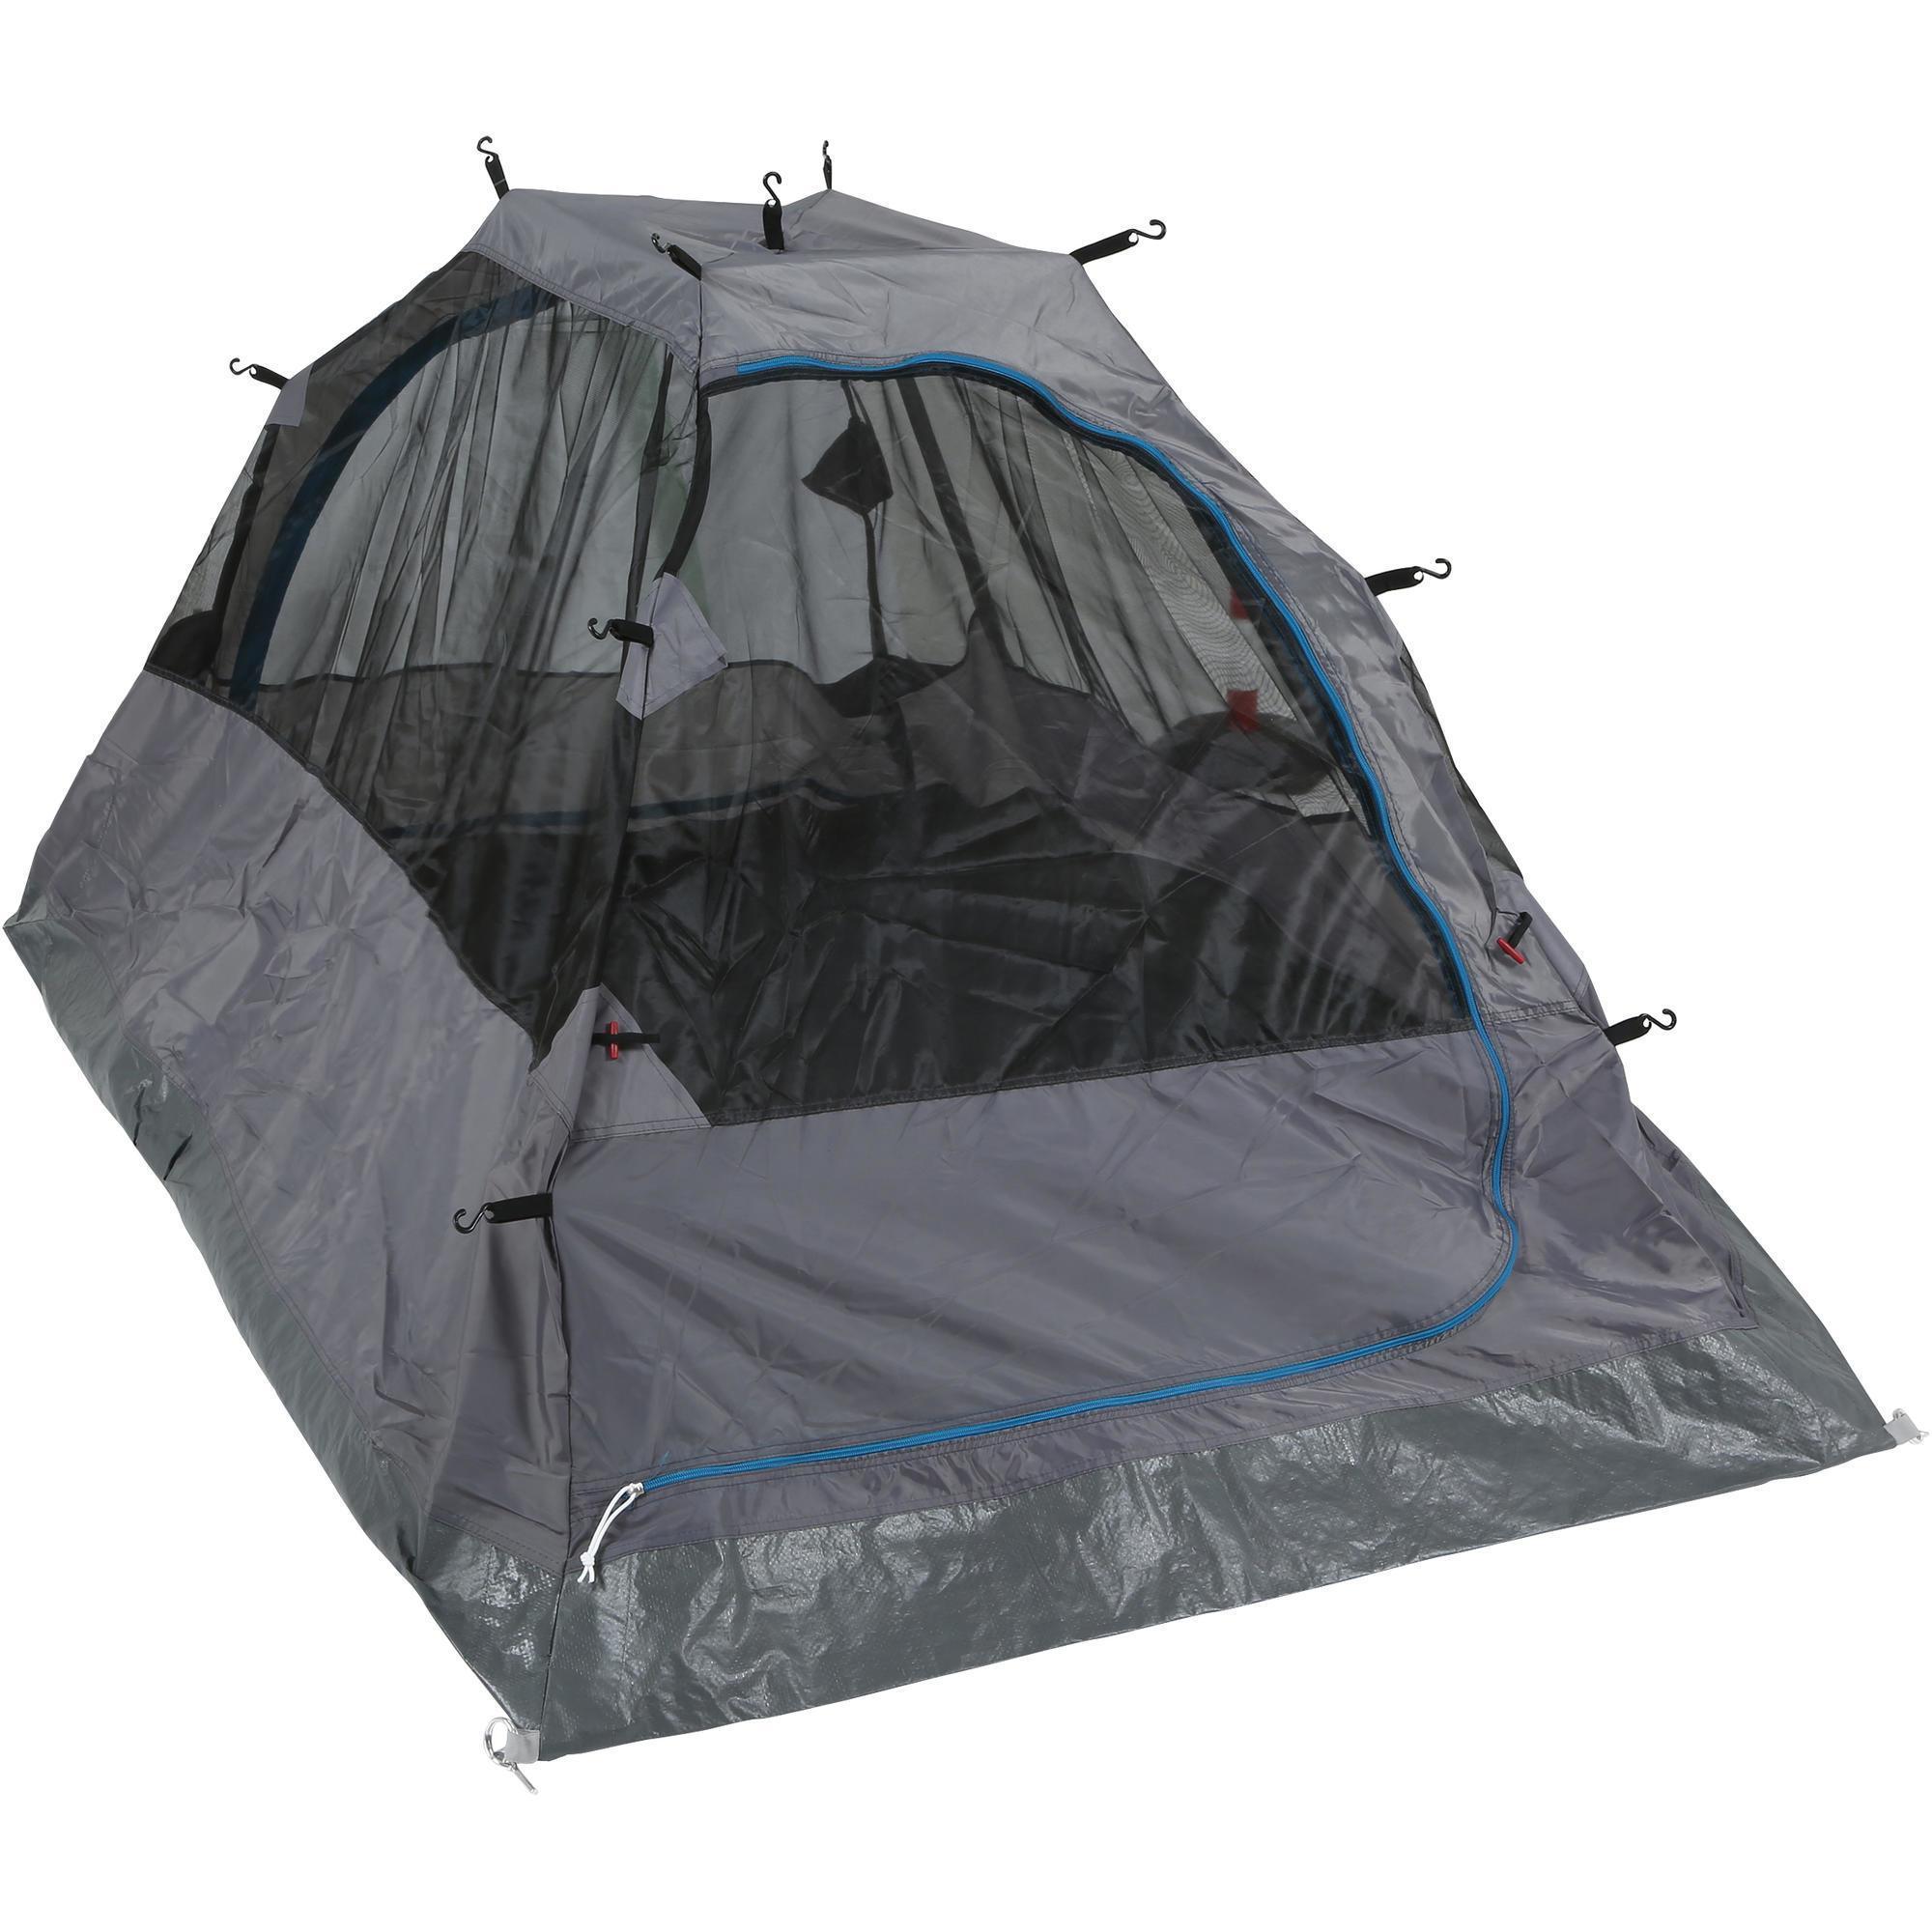 Quechua Slaapcompartiment voor tent Arpenaz 2 Fresh